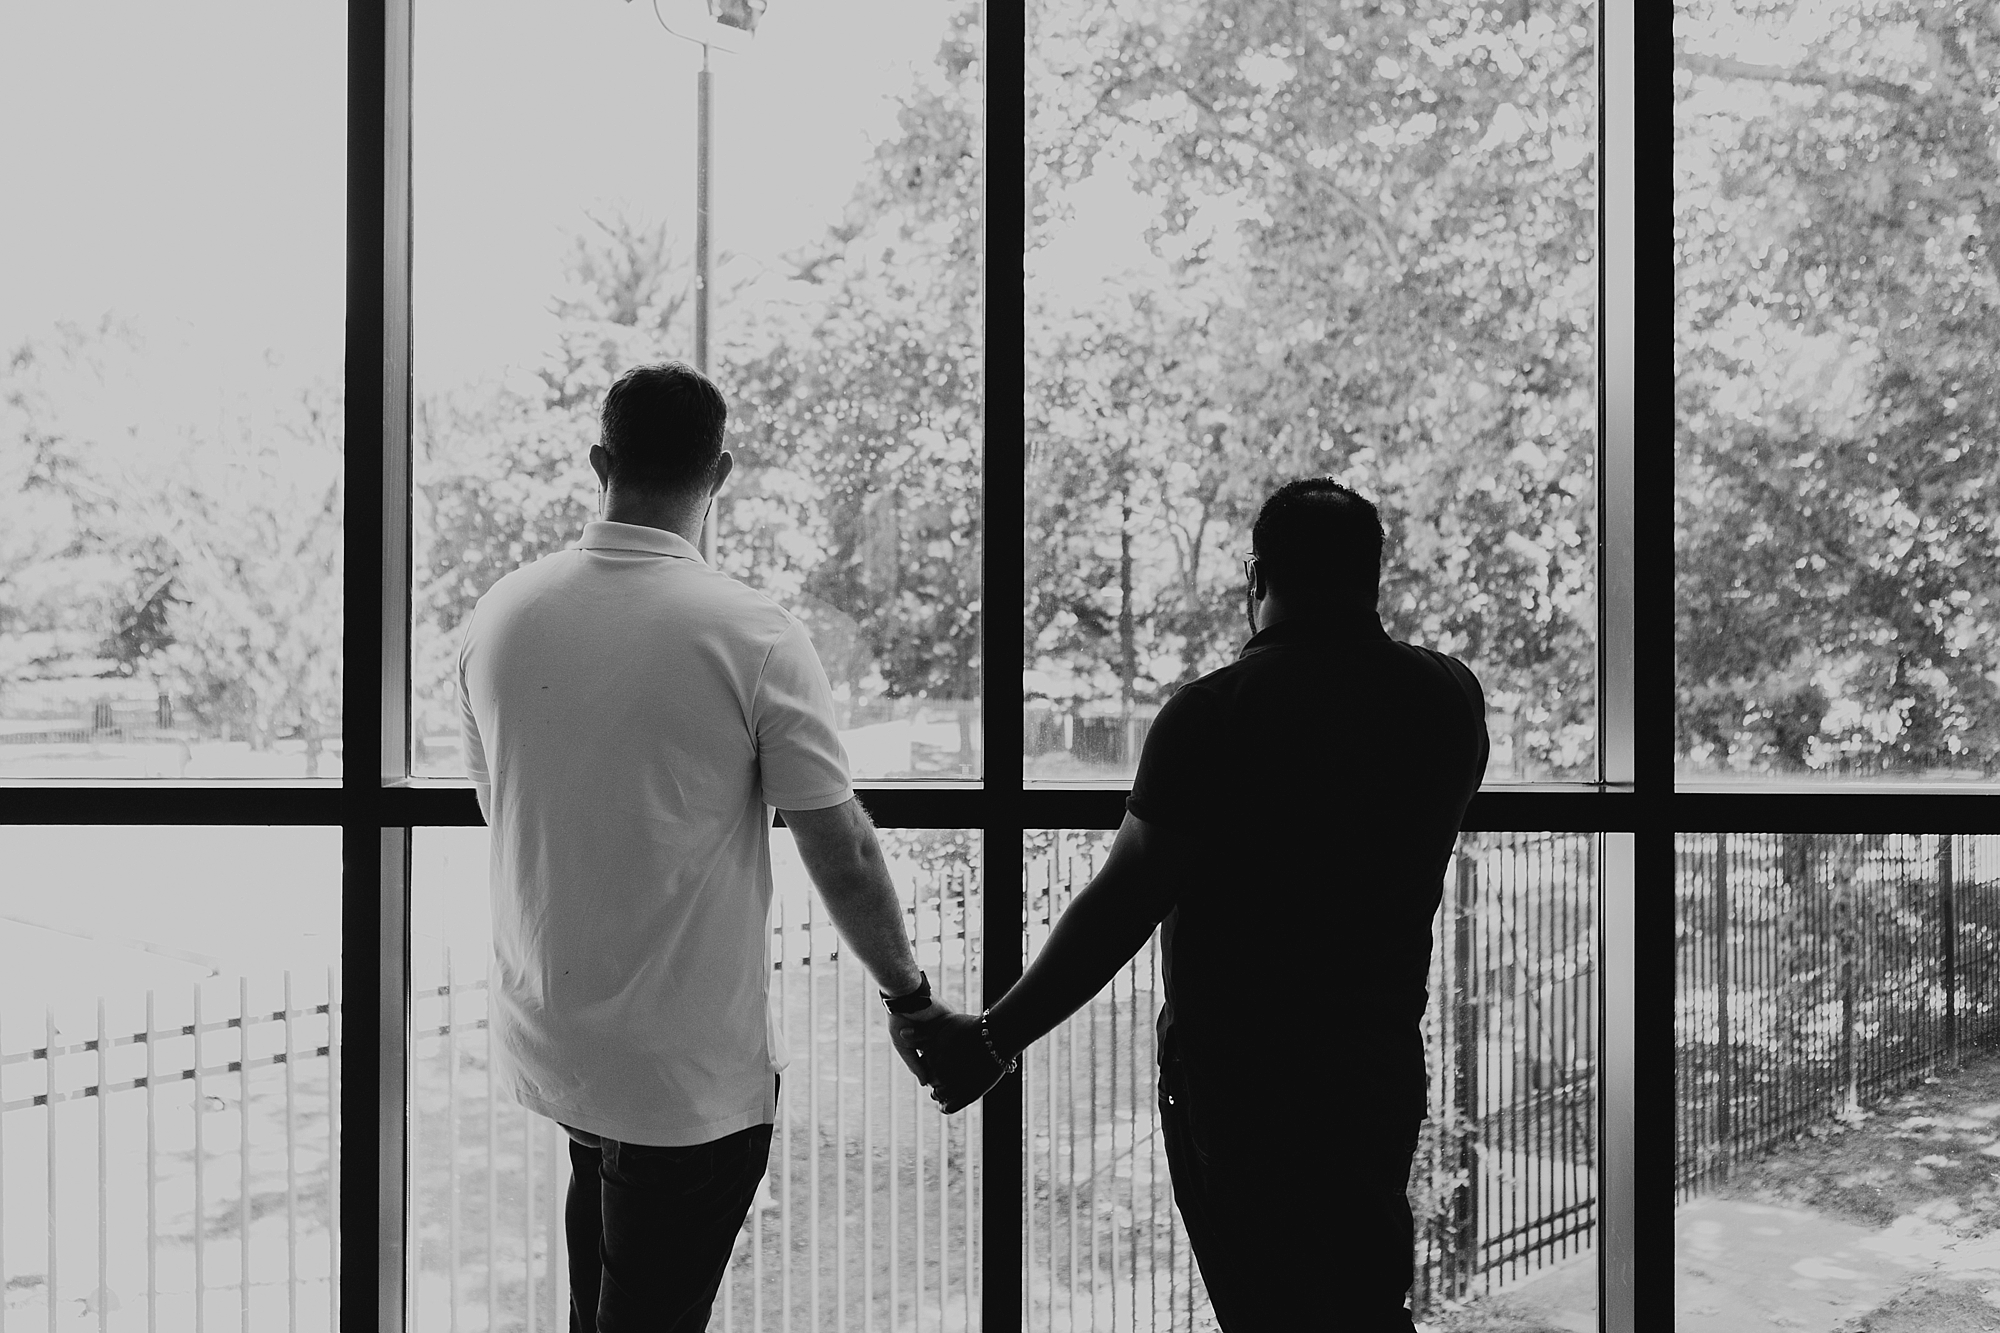 Joe_Mac_Creative_Philadelphia_Philly_LGBT_Gay_Engagement_Wedding_Photography__0016.jpg